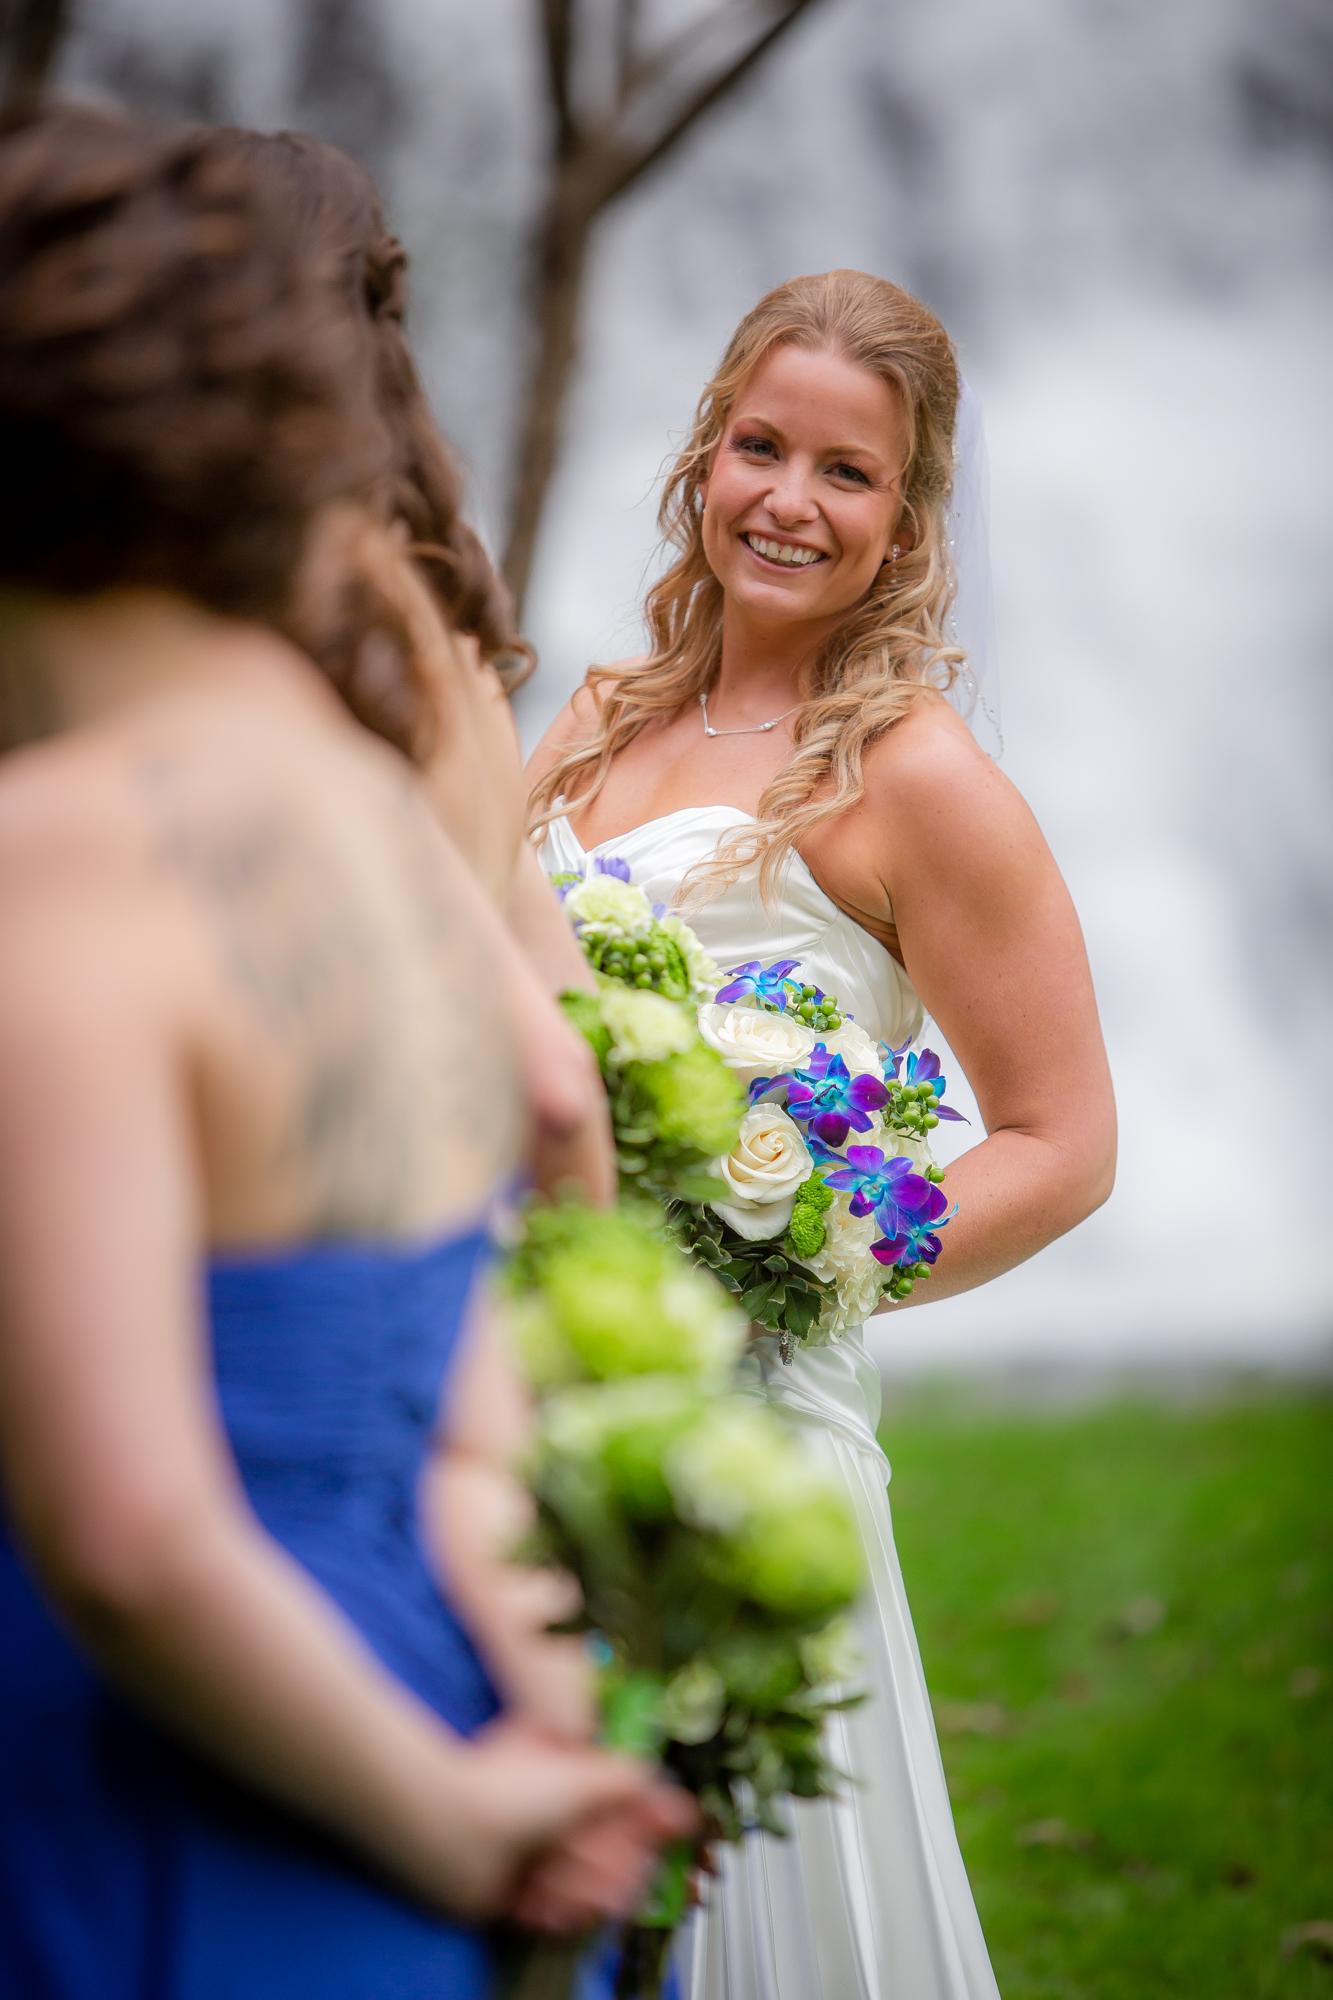 Raddison-Hotel-Corning-NY-Wedding-4248.jpg